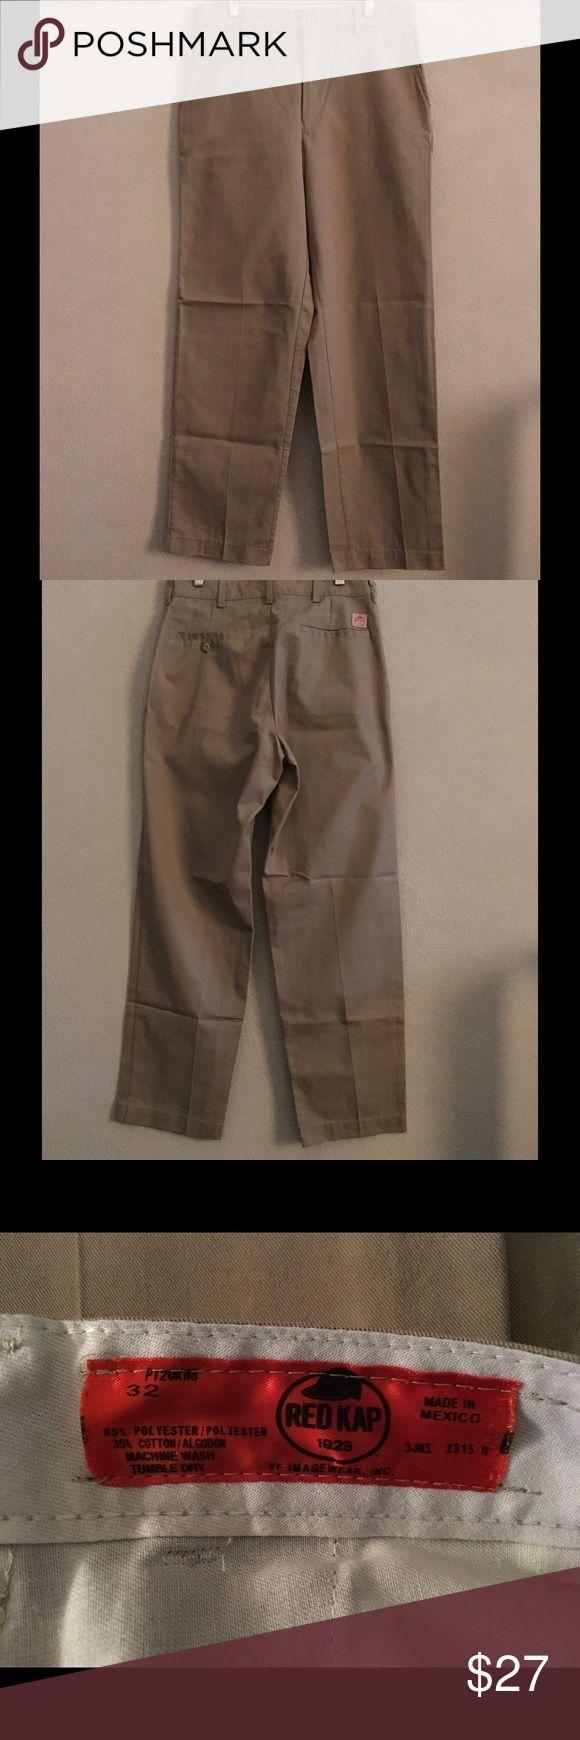 Red Kap Uniform Khaki Slacks ✨Never Worn✨ Flat front uniform khakis.  Men's size 32.  3 pair available. 🚫No Trades❗️Reasonable offers only 🎯 Red Kap Pants Chinos & Khakis